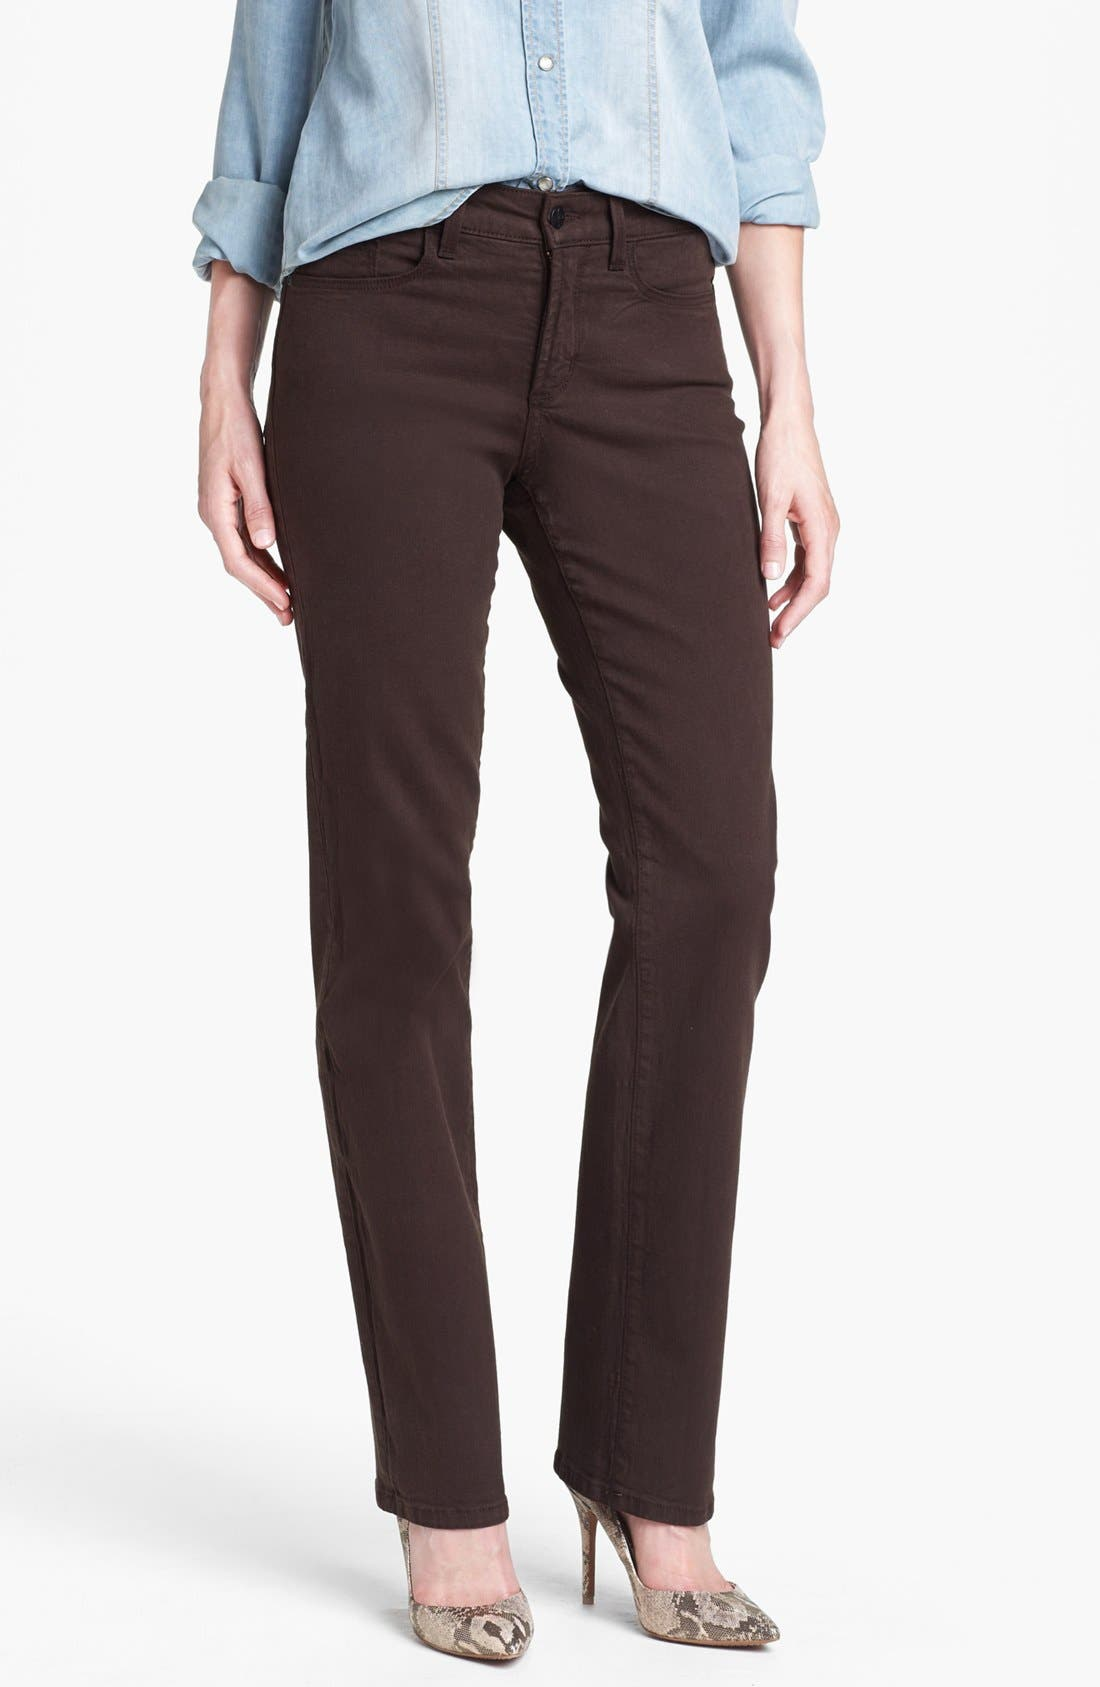 Alternate Image 1 Selected - NYDJ 'Marilyn' Embellished Pocket Stretch Straight Leg Jeans (Ganache) (Regular & Petite)